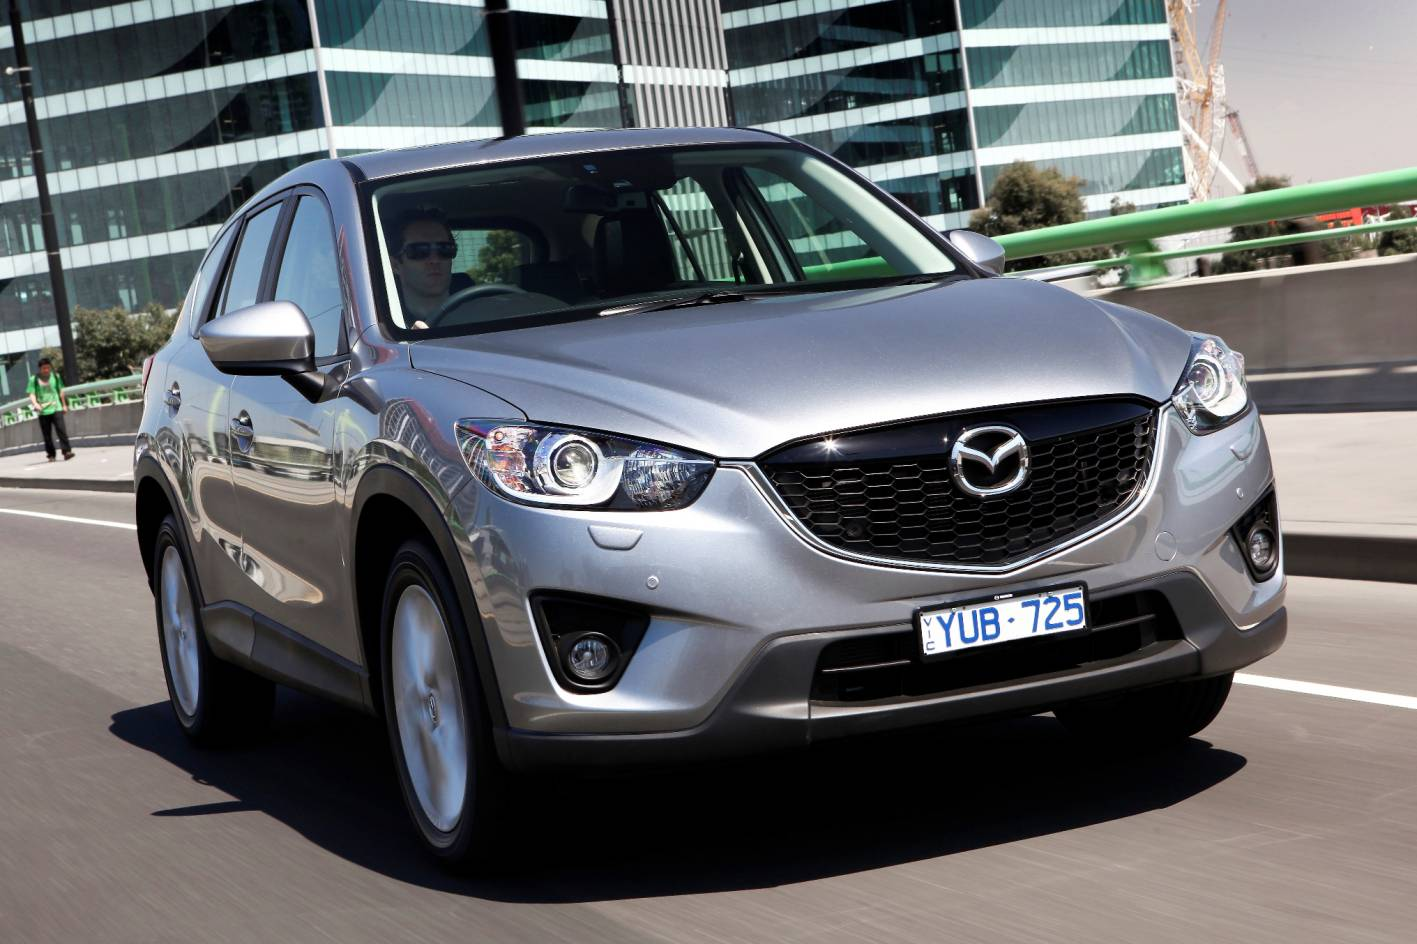 2014 Mazda Cx 5 Testimonial Auto Expert By John Cadogan Save